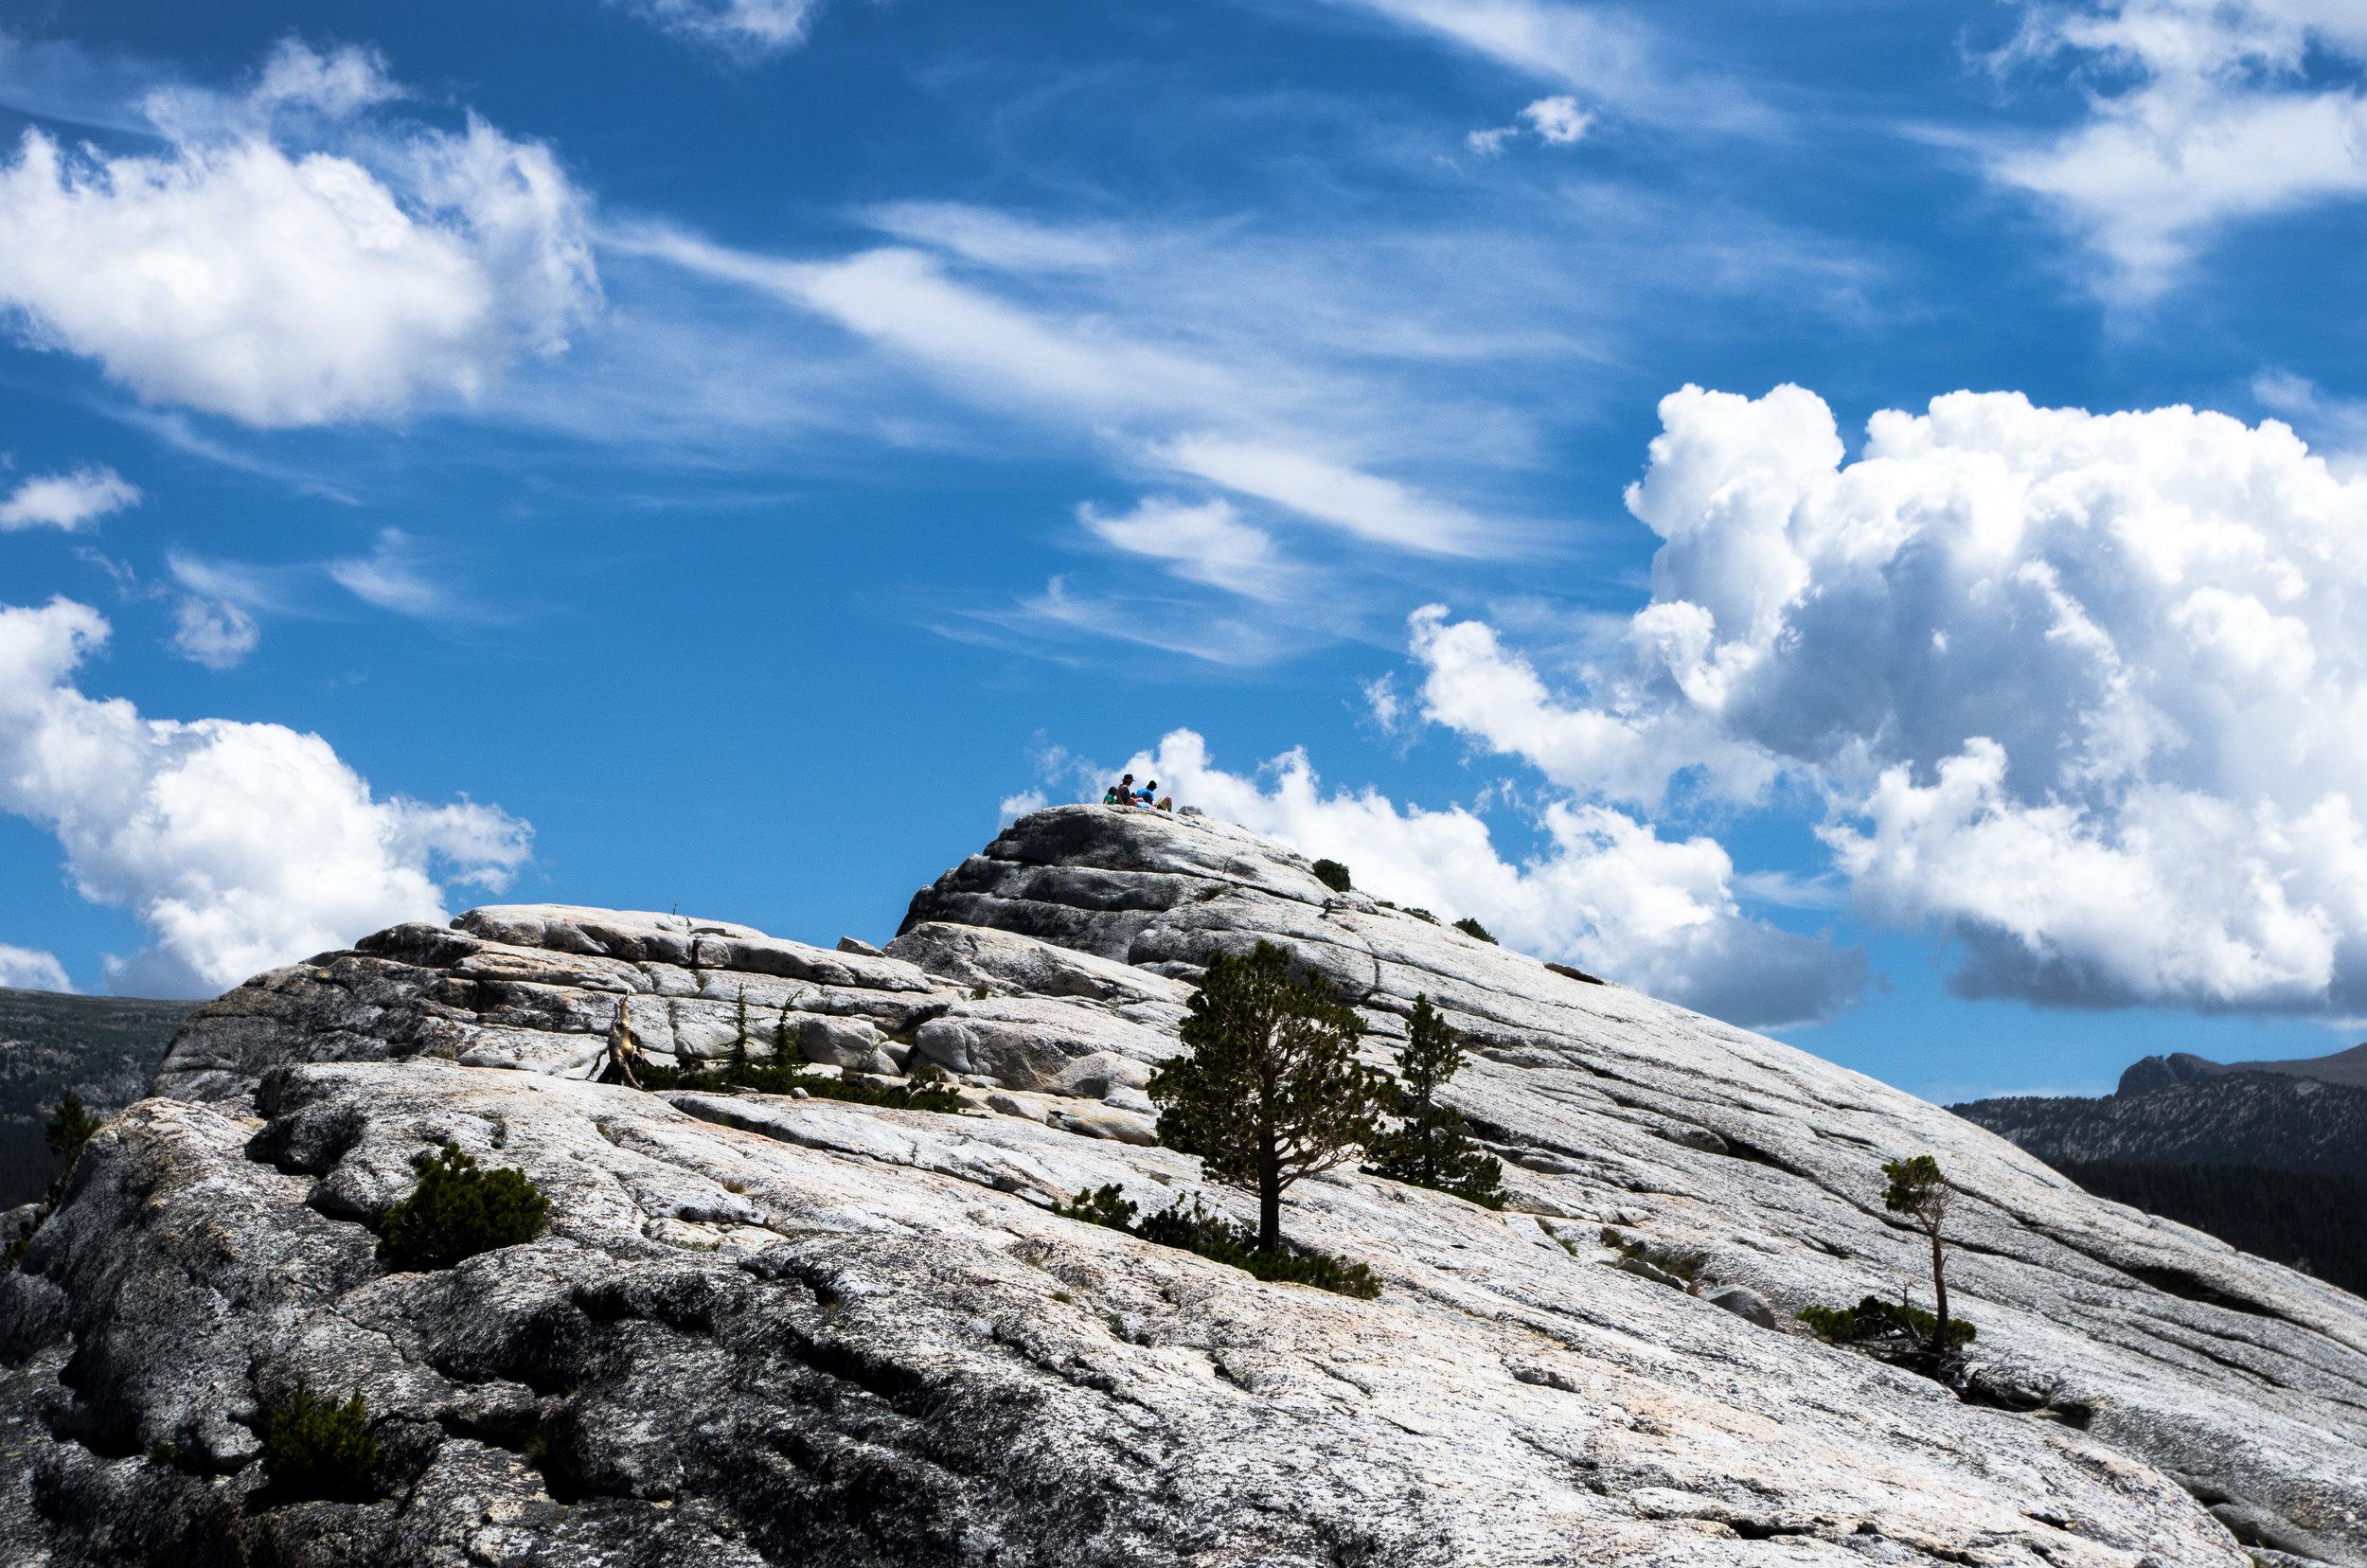 Hikers atop Lembert Dome. Tuolumne Meadows, Yosemite National Park, CA